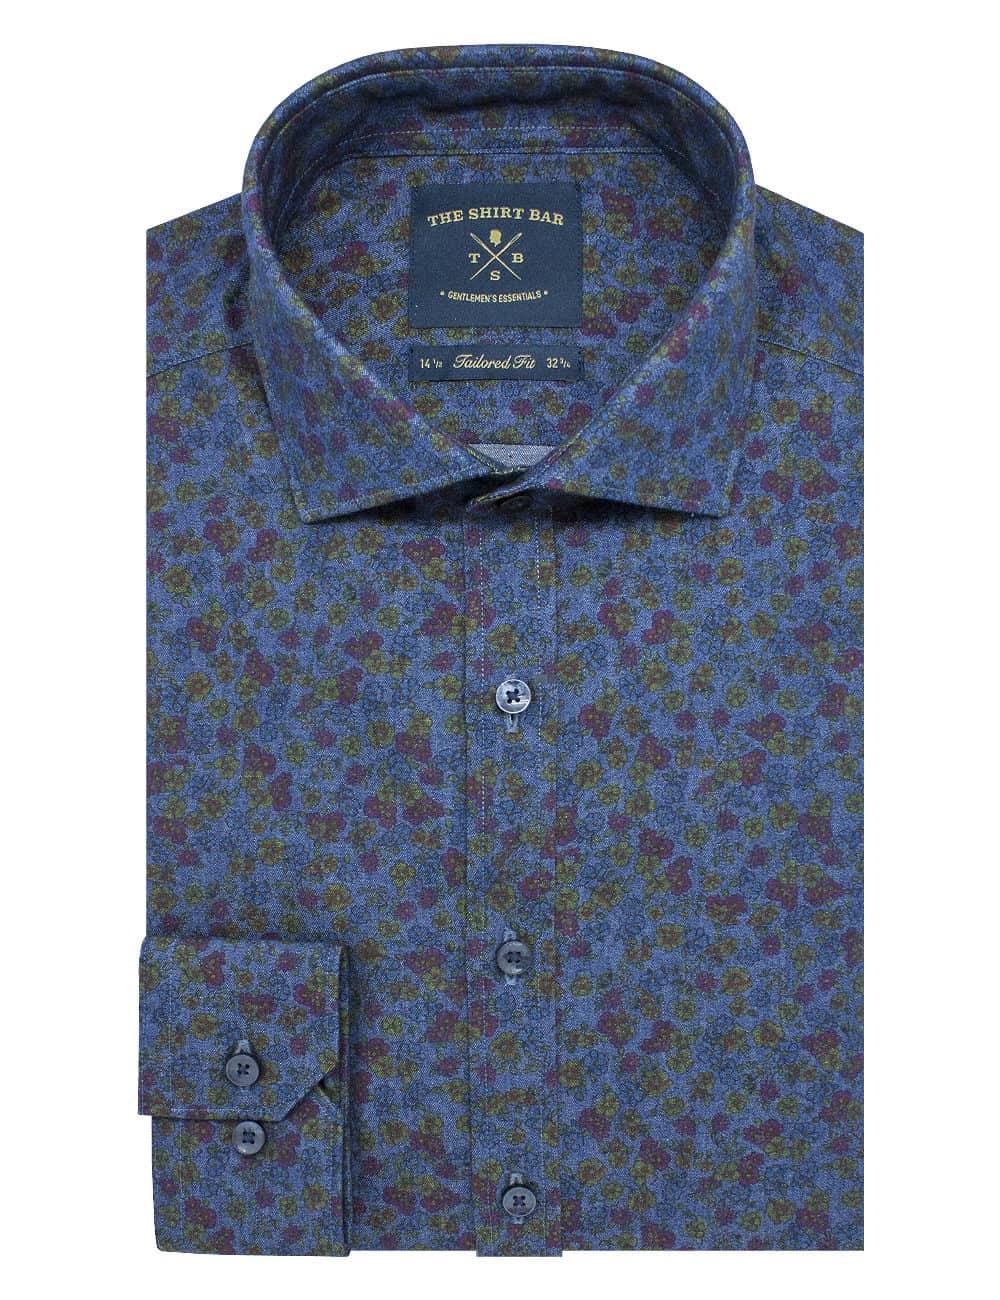 Tailored Fit 100% Premium Cotton Digitally Printed Blue Denim Print Italian Fabric Silky Finish Long Sleeve Single Cuff Shirt TF1A4.18